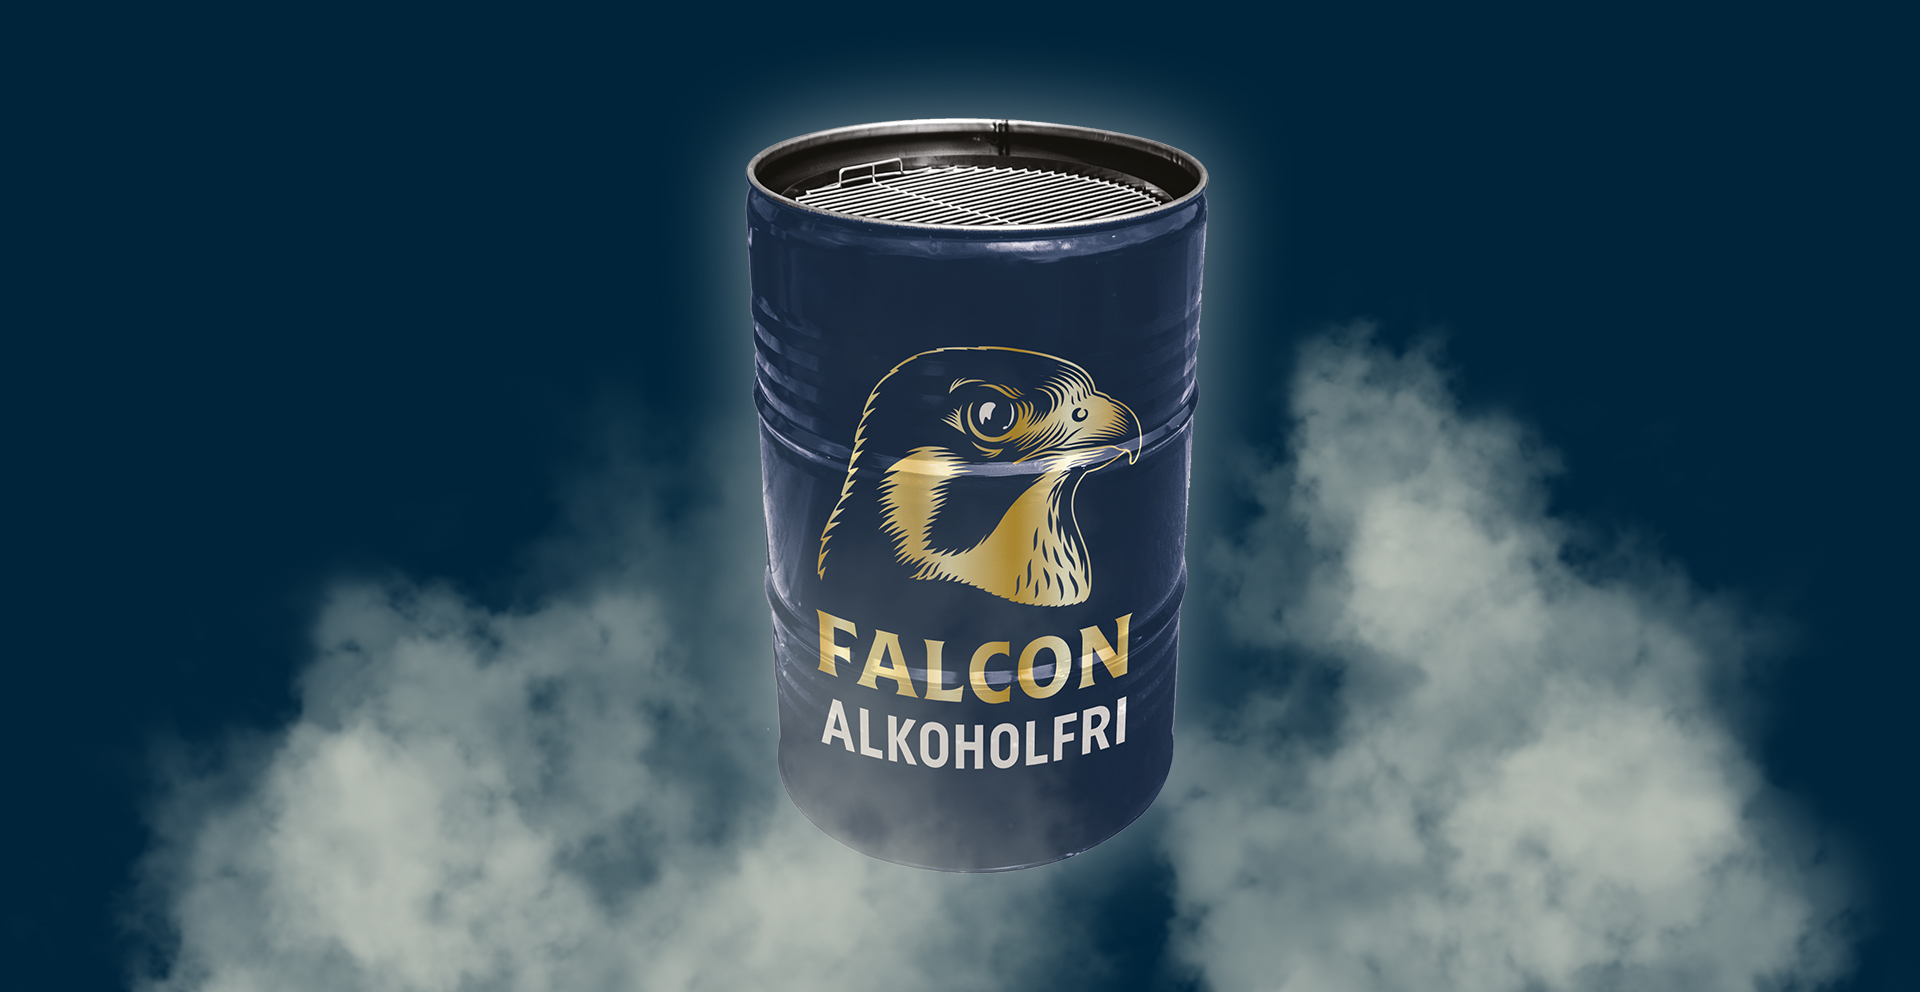 falcon_tavling_grill_2019.jpg